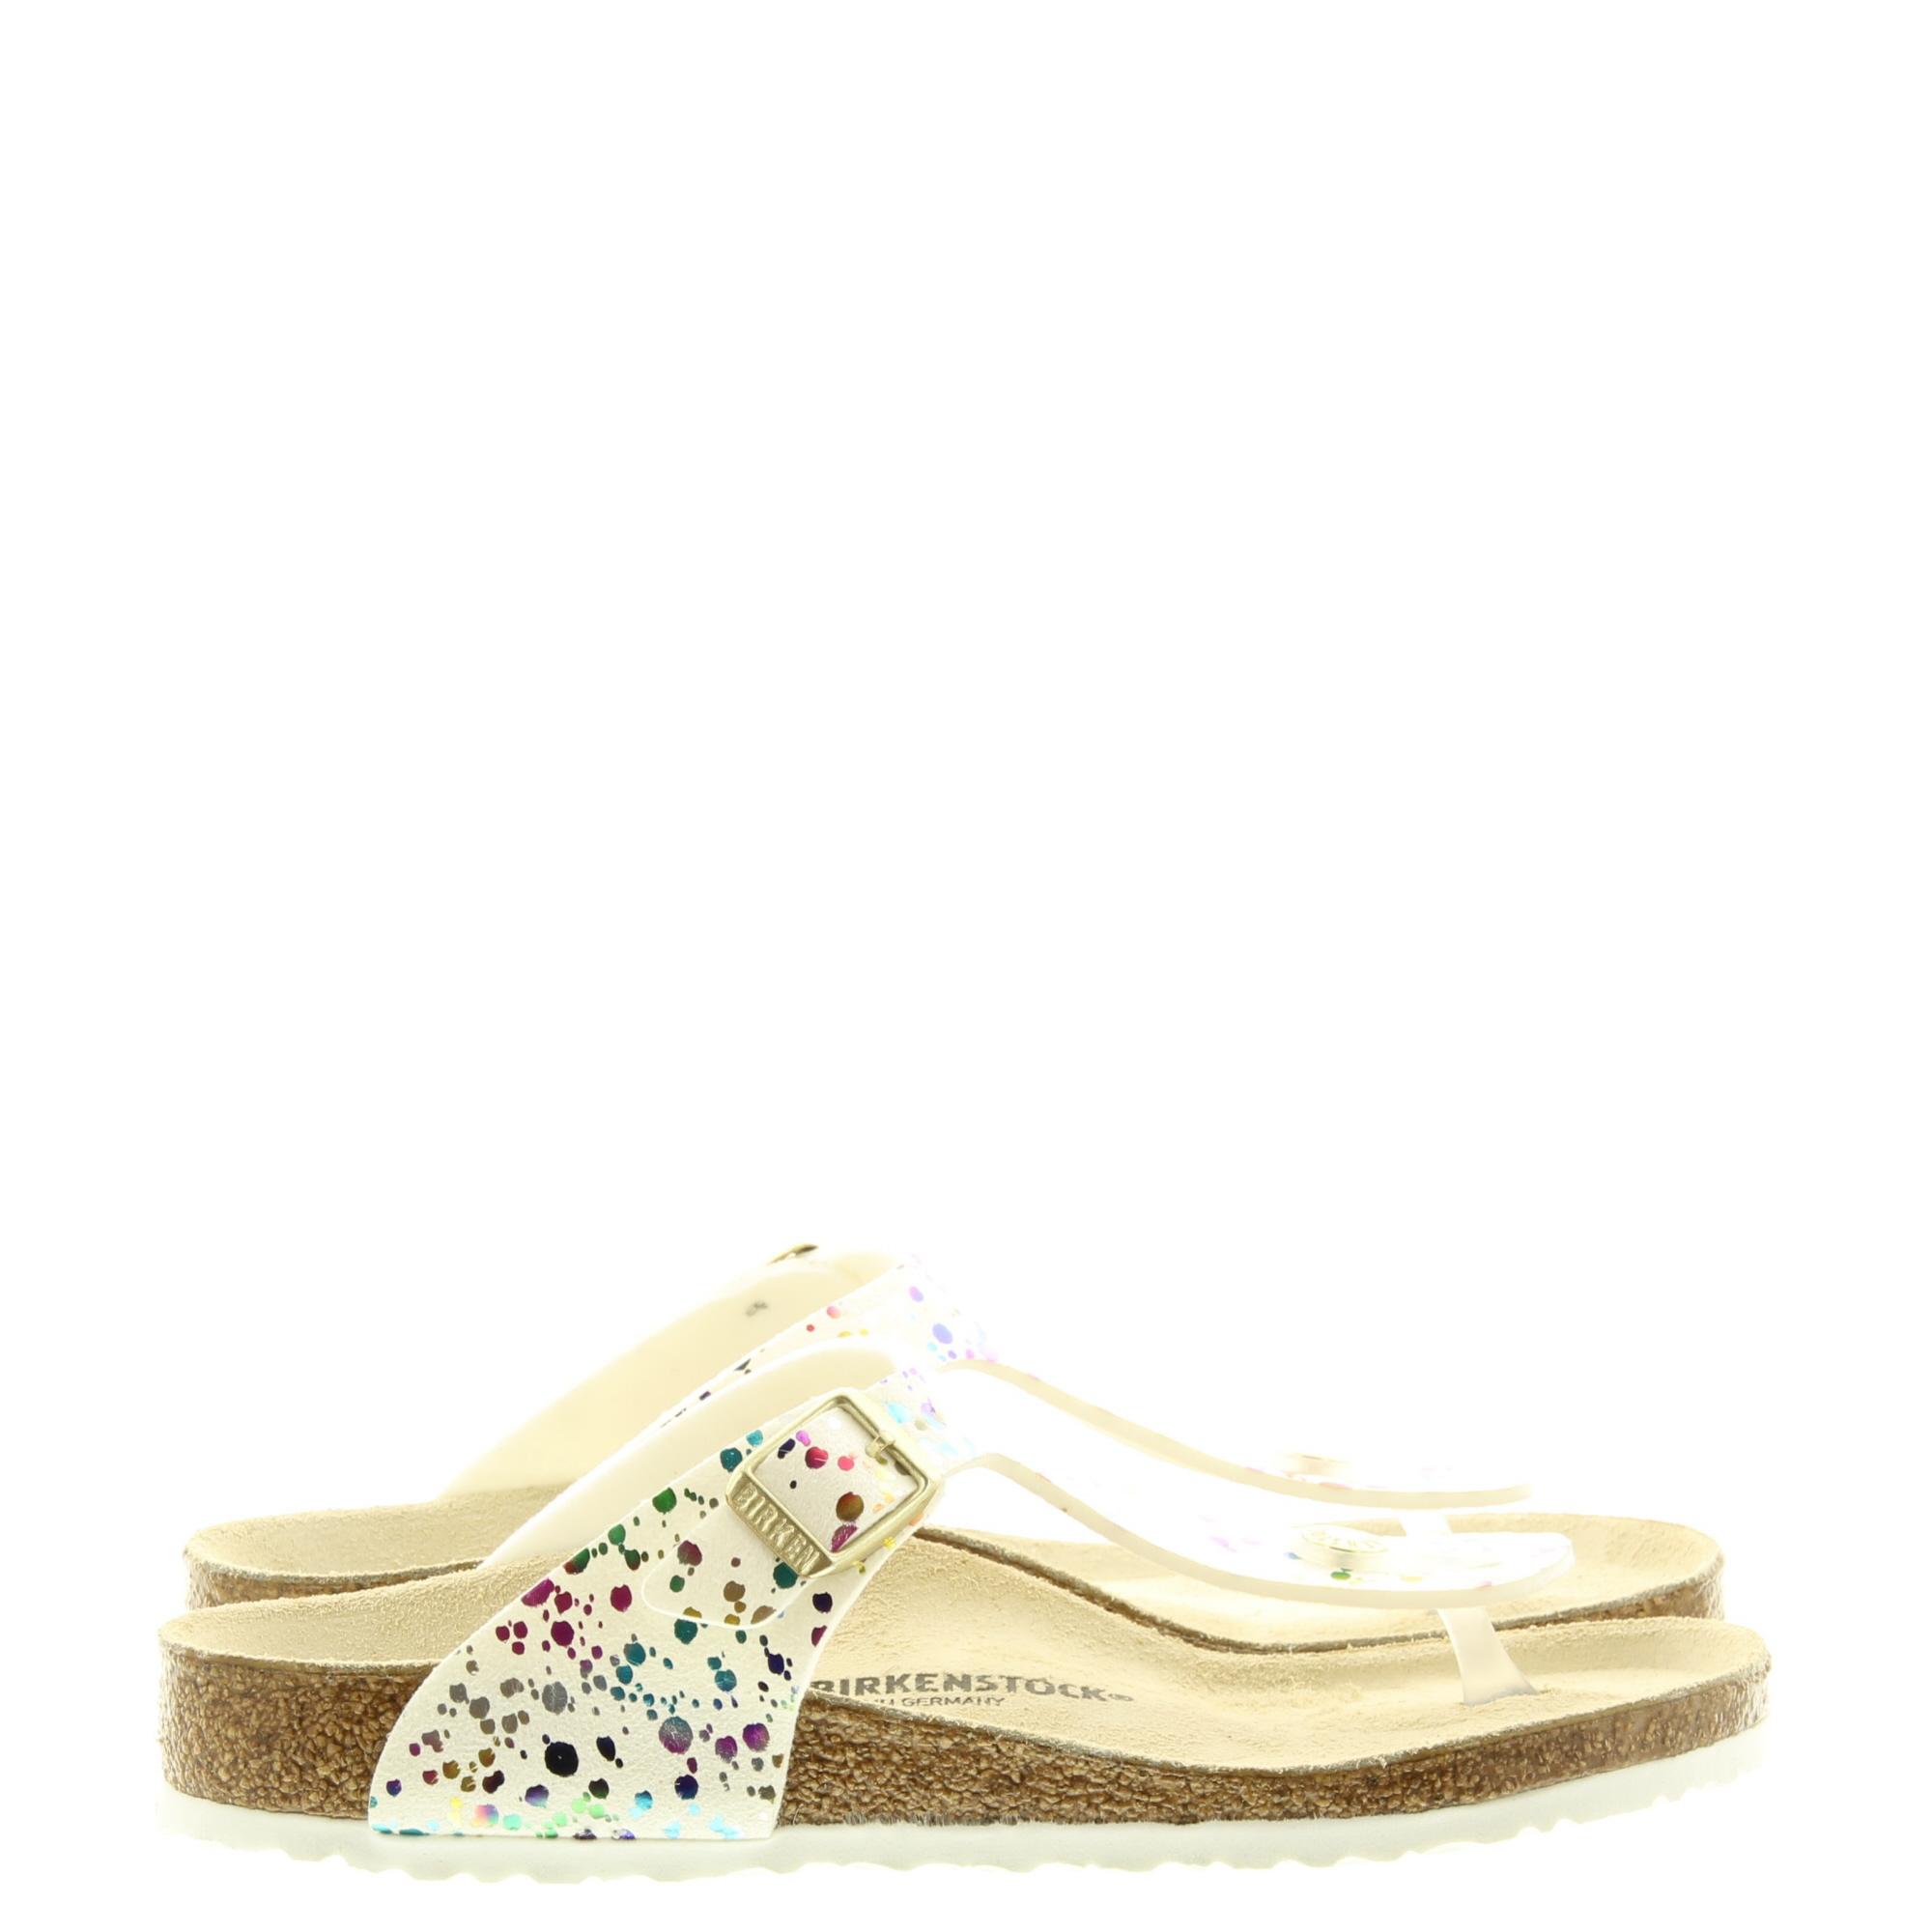 Birkenstock 1019755 Gizeh Kids Confetti White Pop